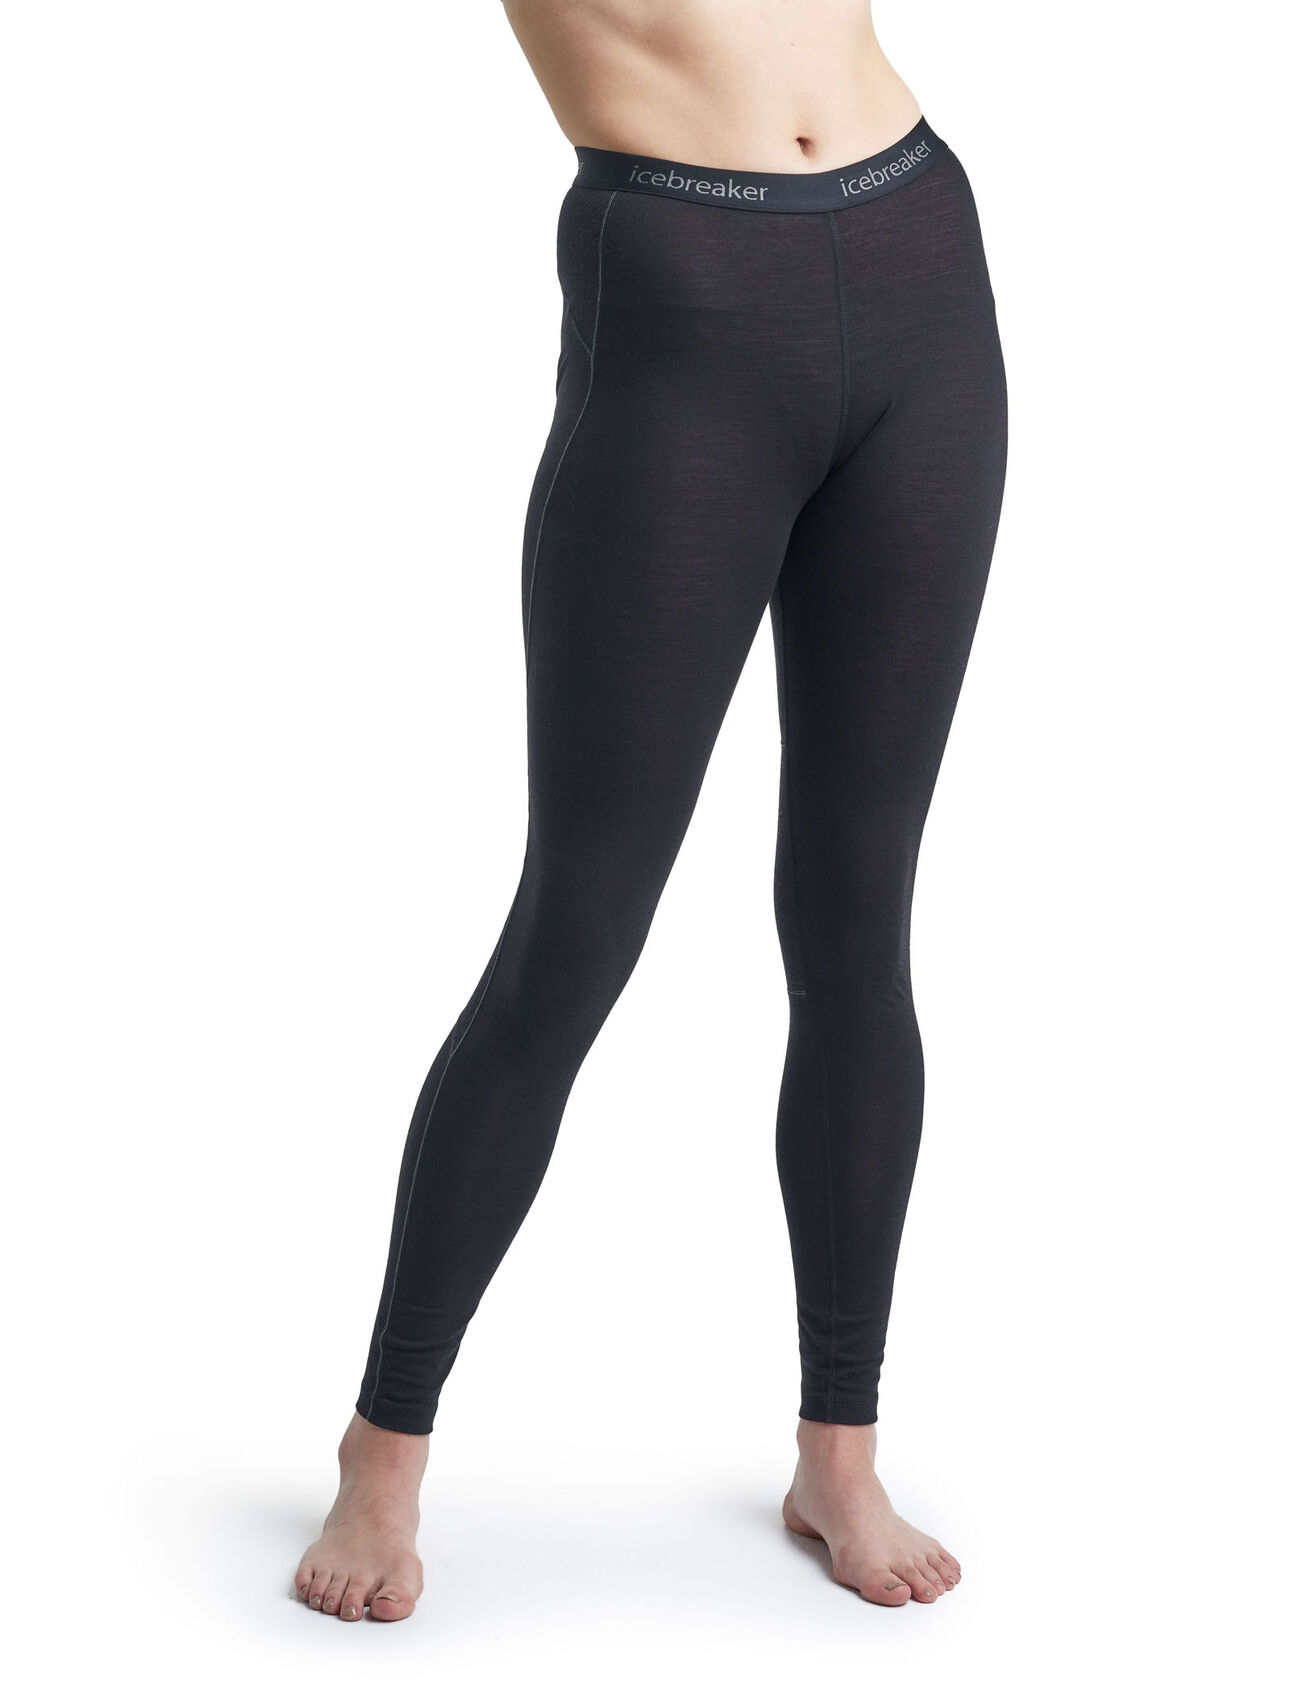 BodyFitZone™ 150 Zone打底裤